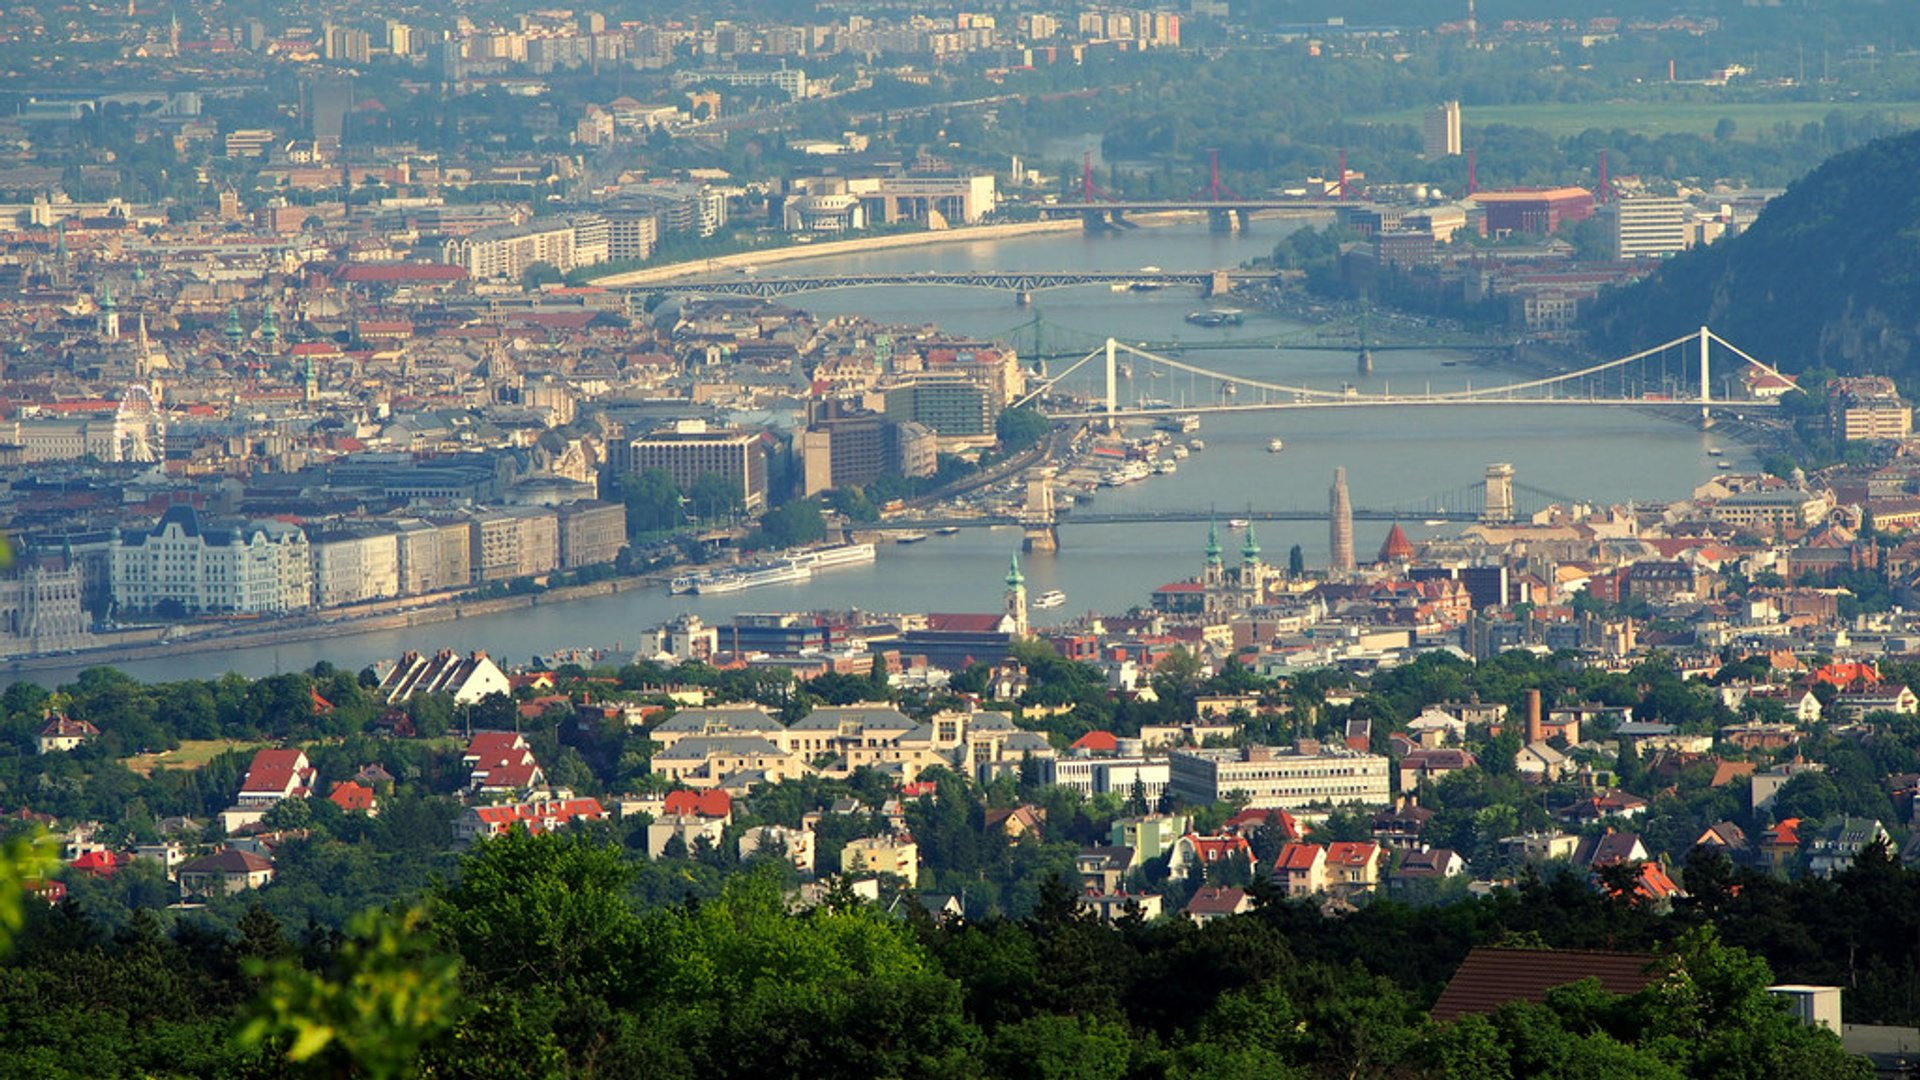 View of Budapest from Hármashatár-hegy 2019